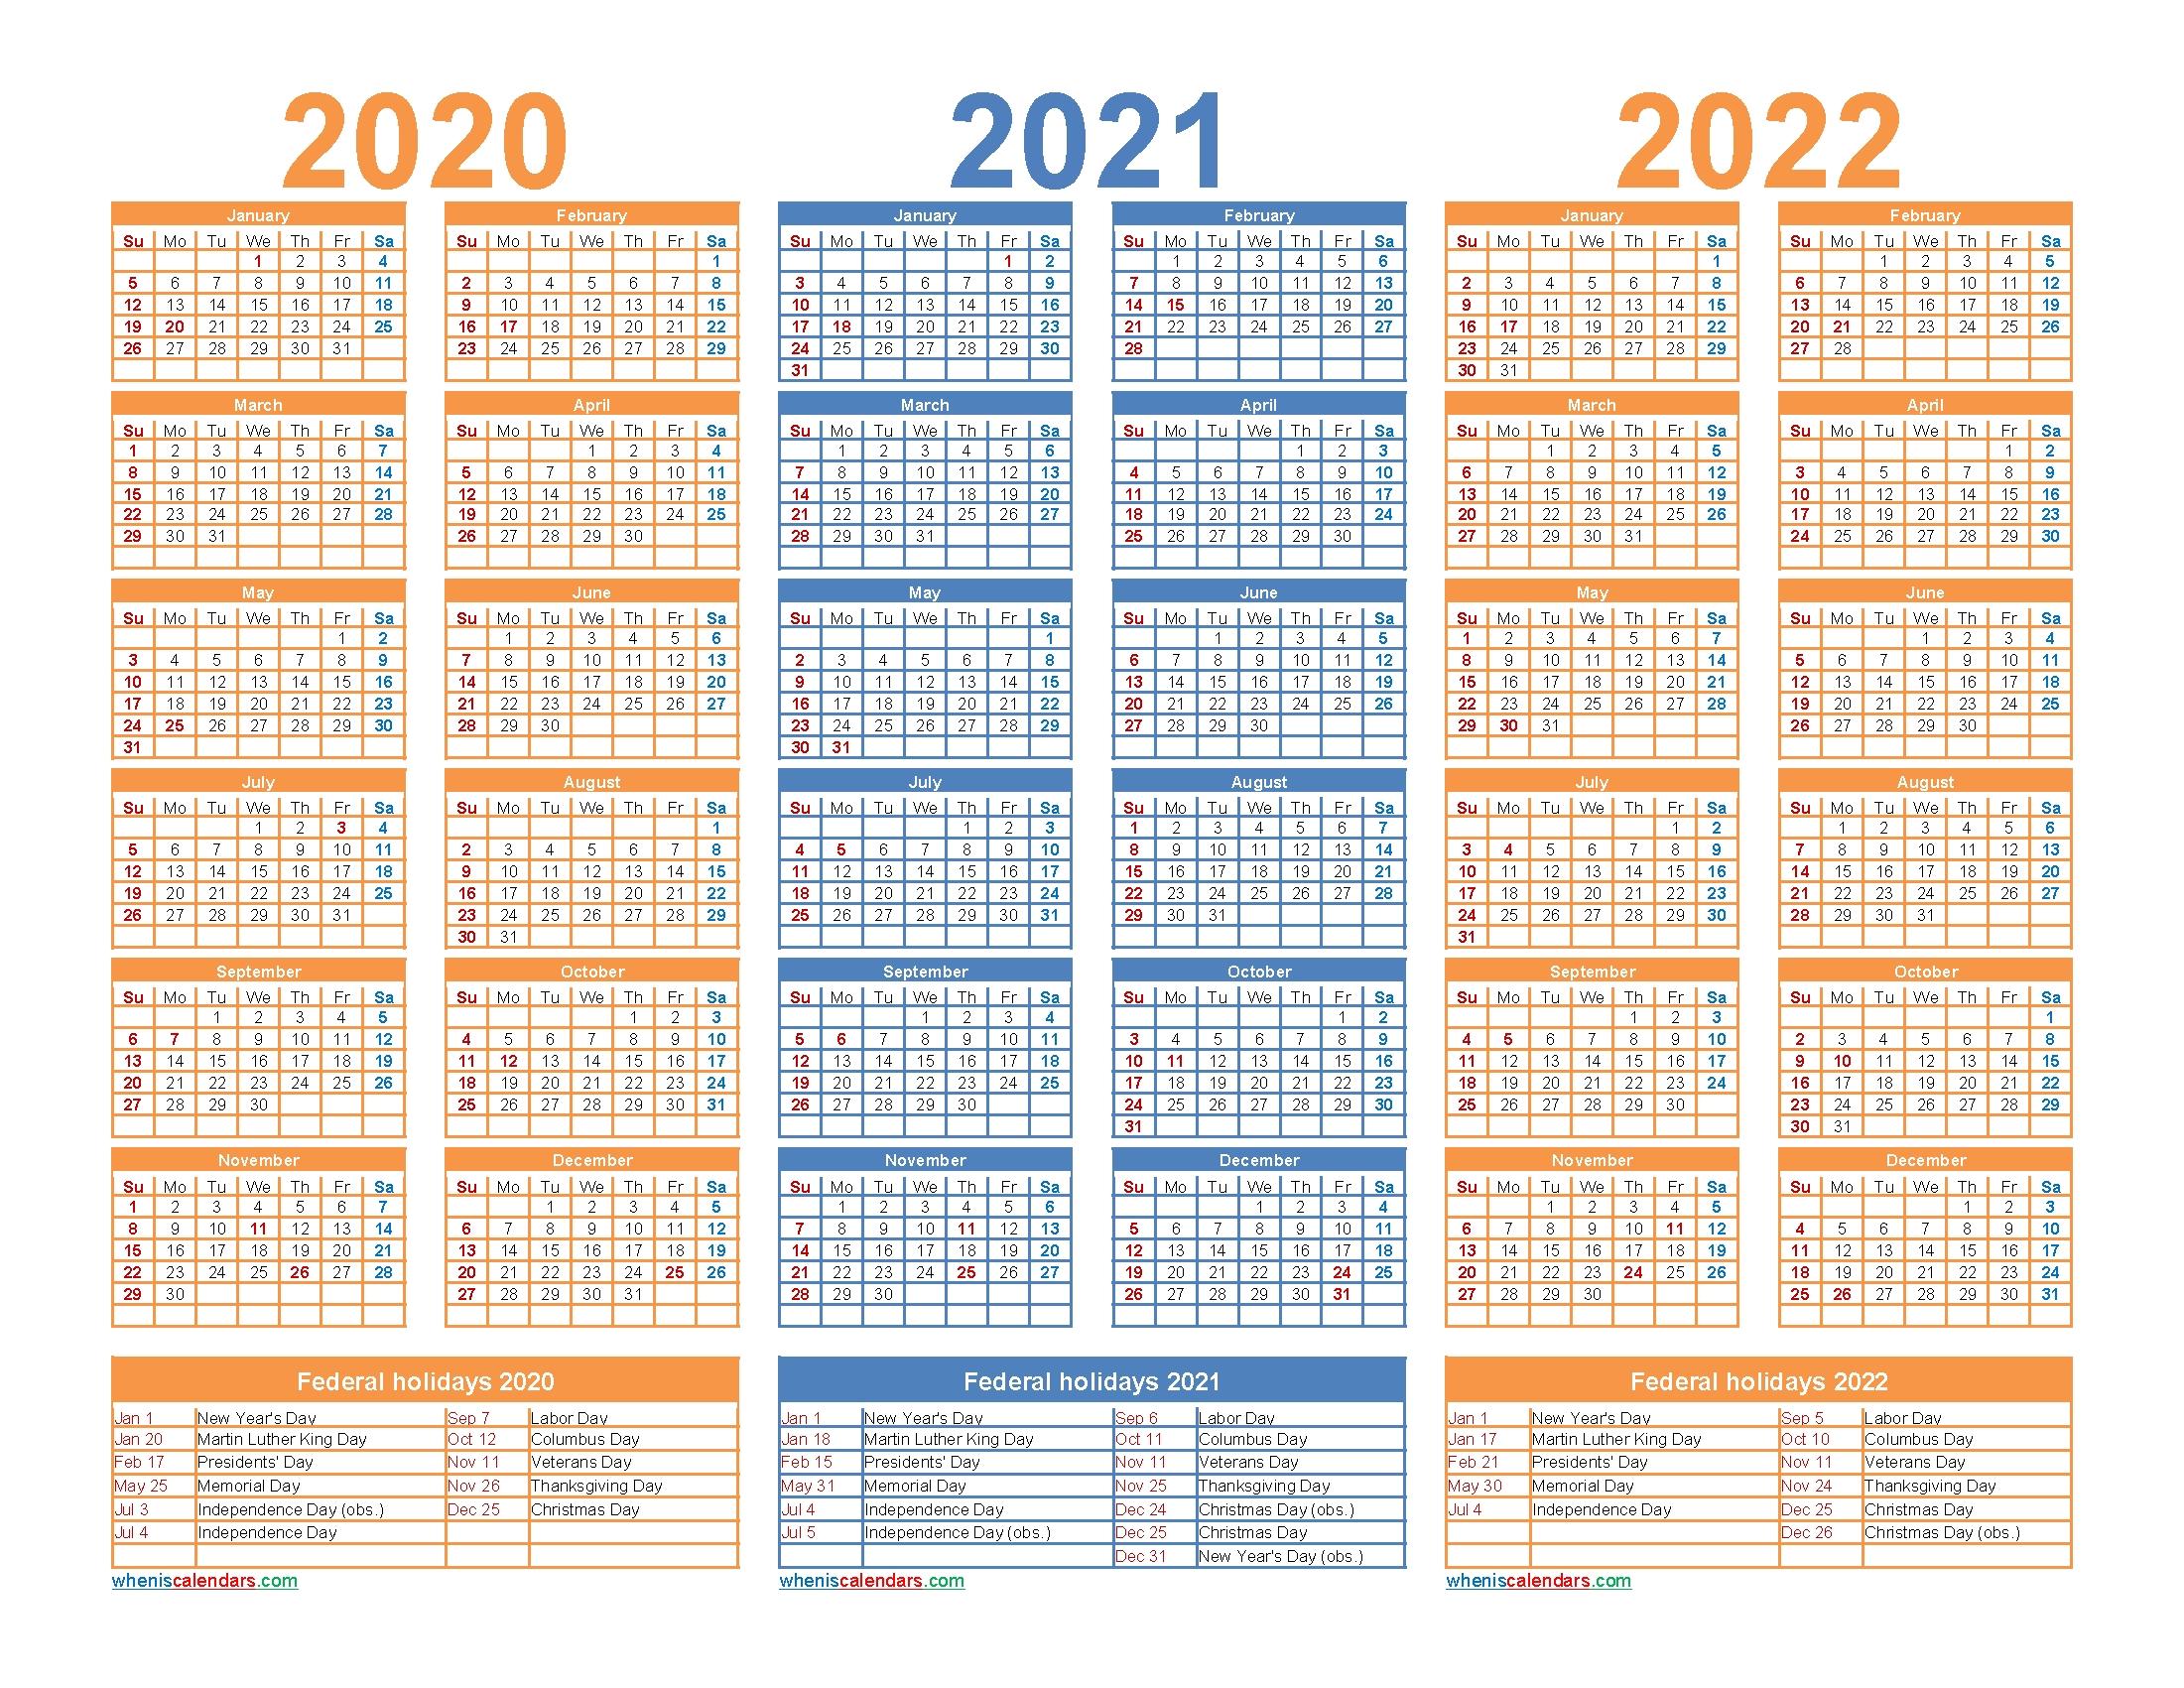 3 Year Calendar 2020 To 2022 Printable | Free Printable 2020